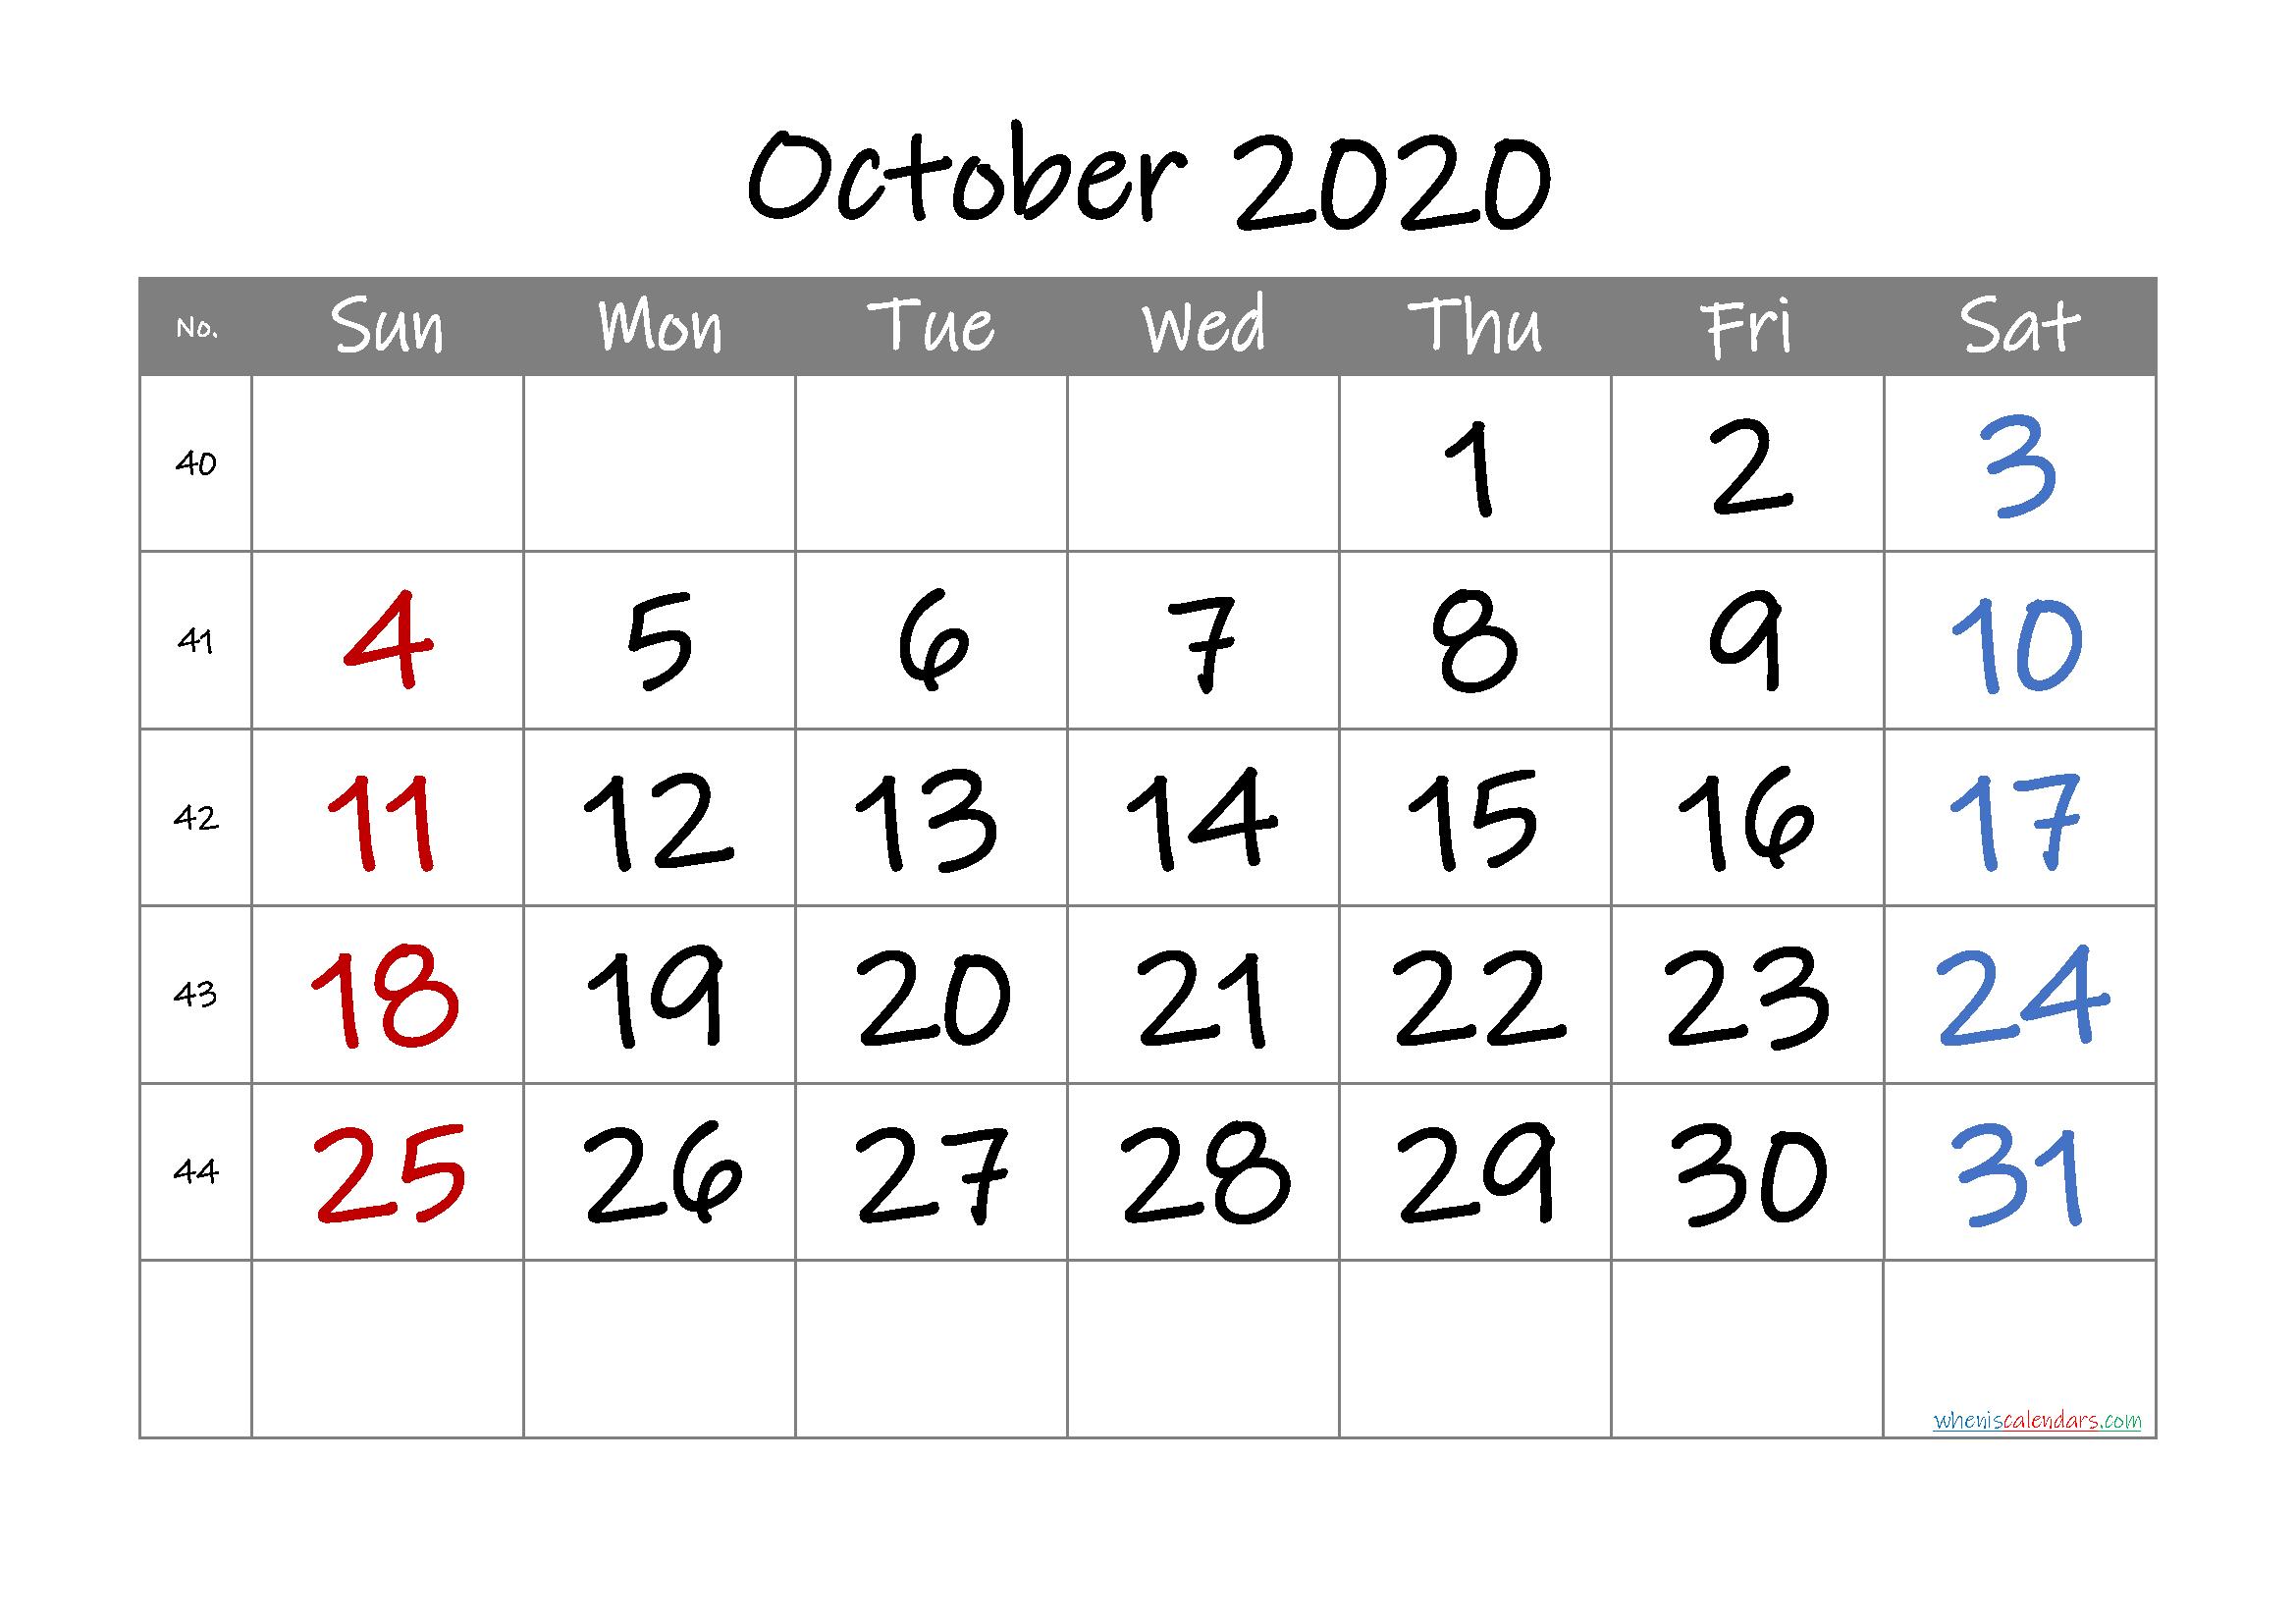 2020 October Free Printable Calendar